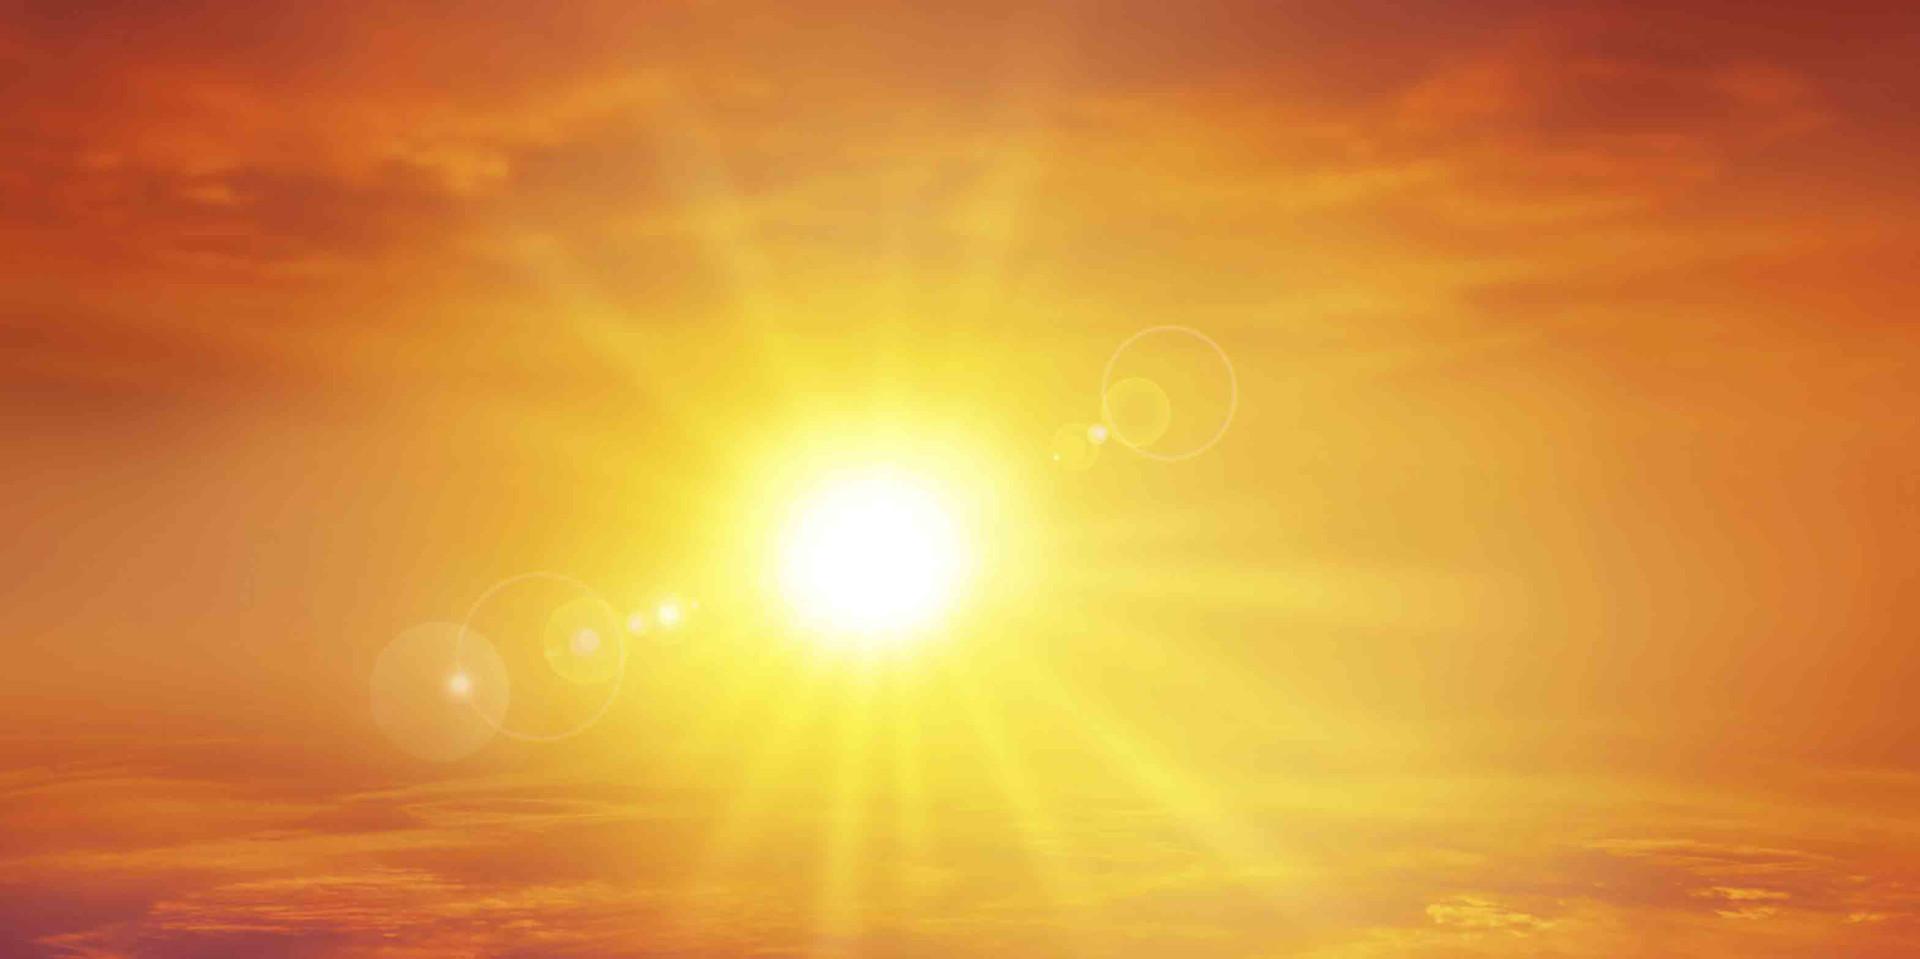 Late Summer Sun Holidays - Travel Blog - Original Travel